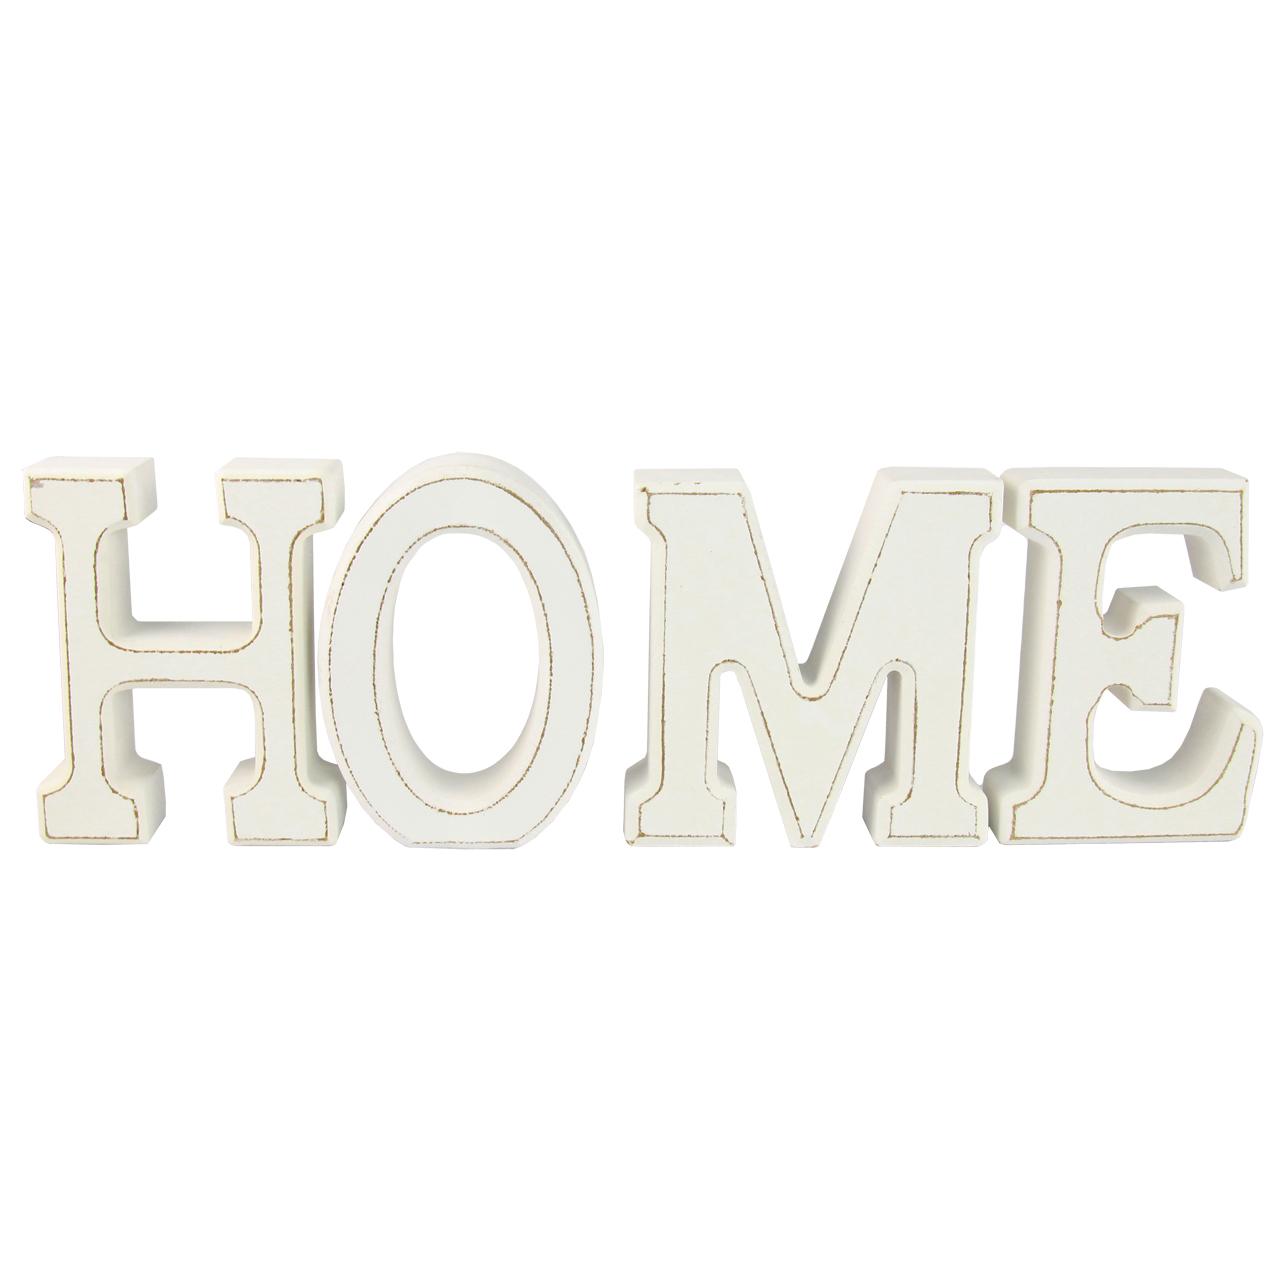 Litere Decorative Home Din Lemn Alb